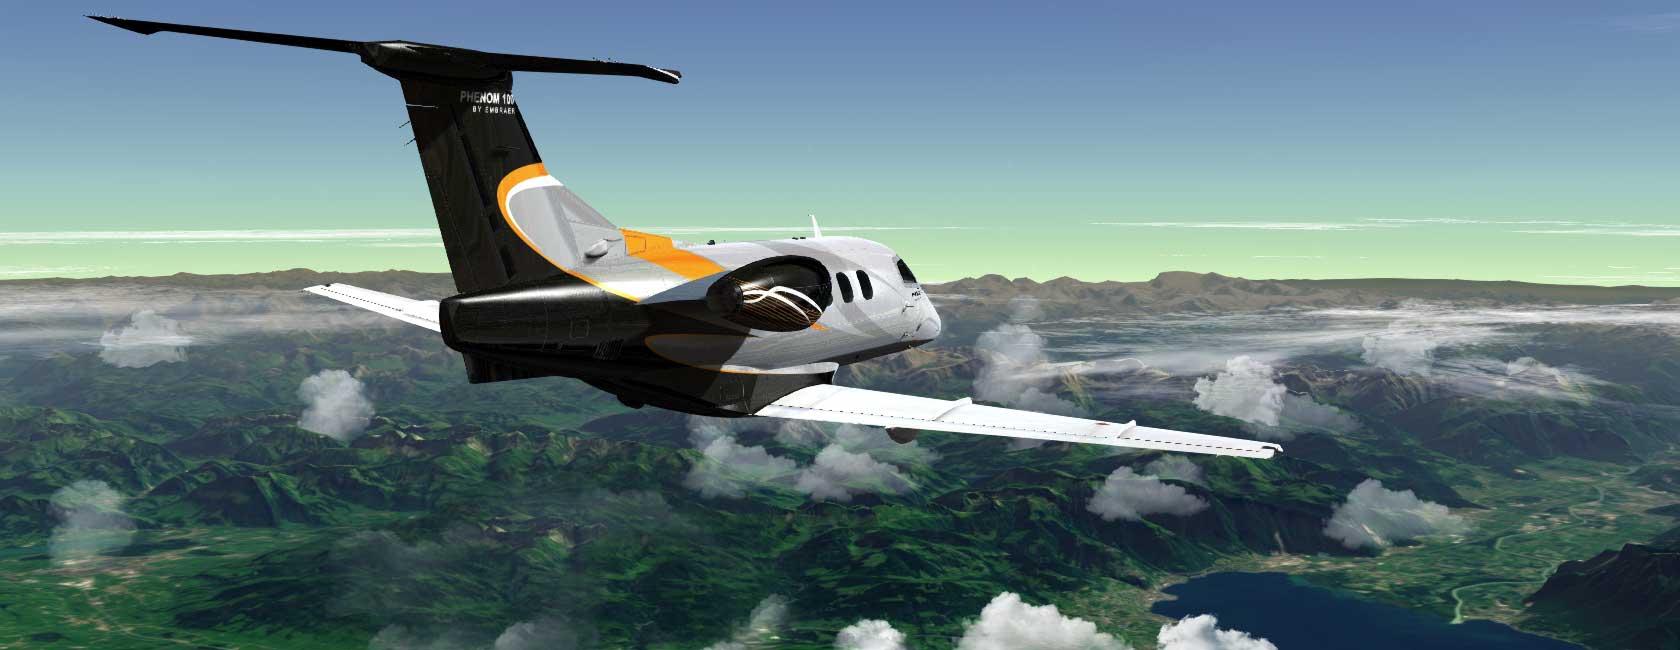 GeoFS - The Free Online Flight Simulator